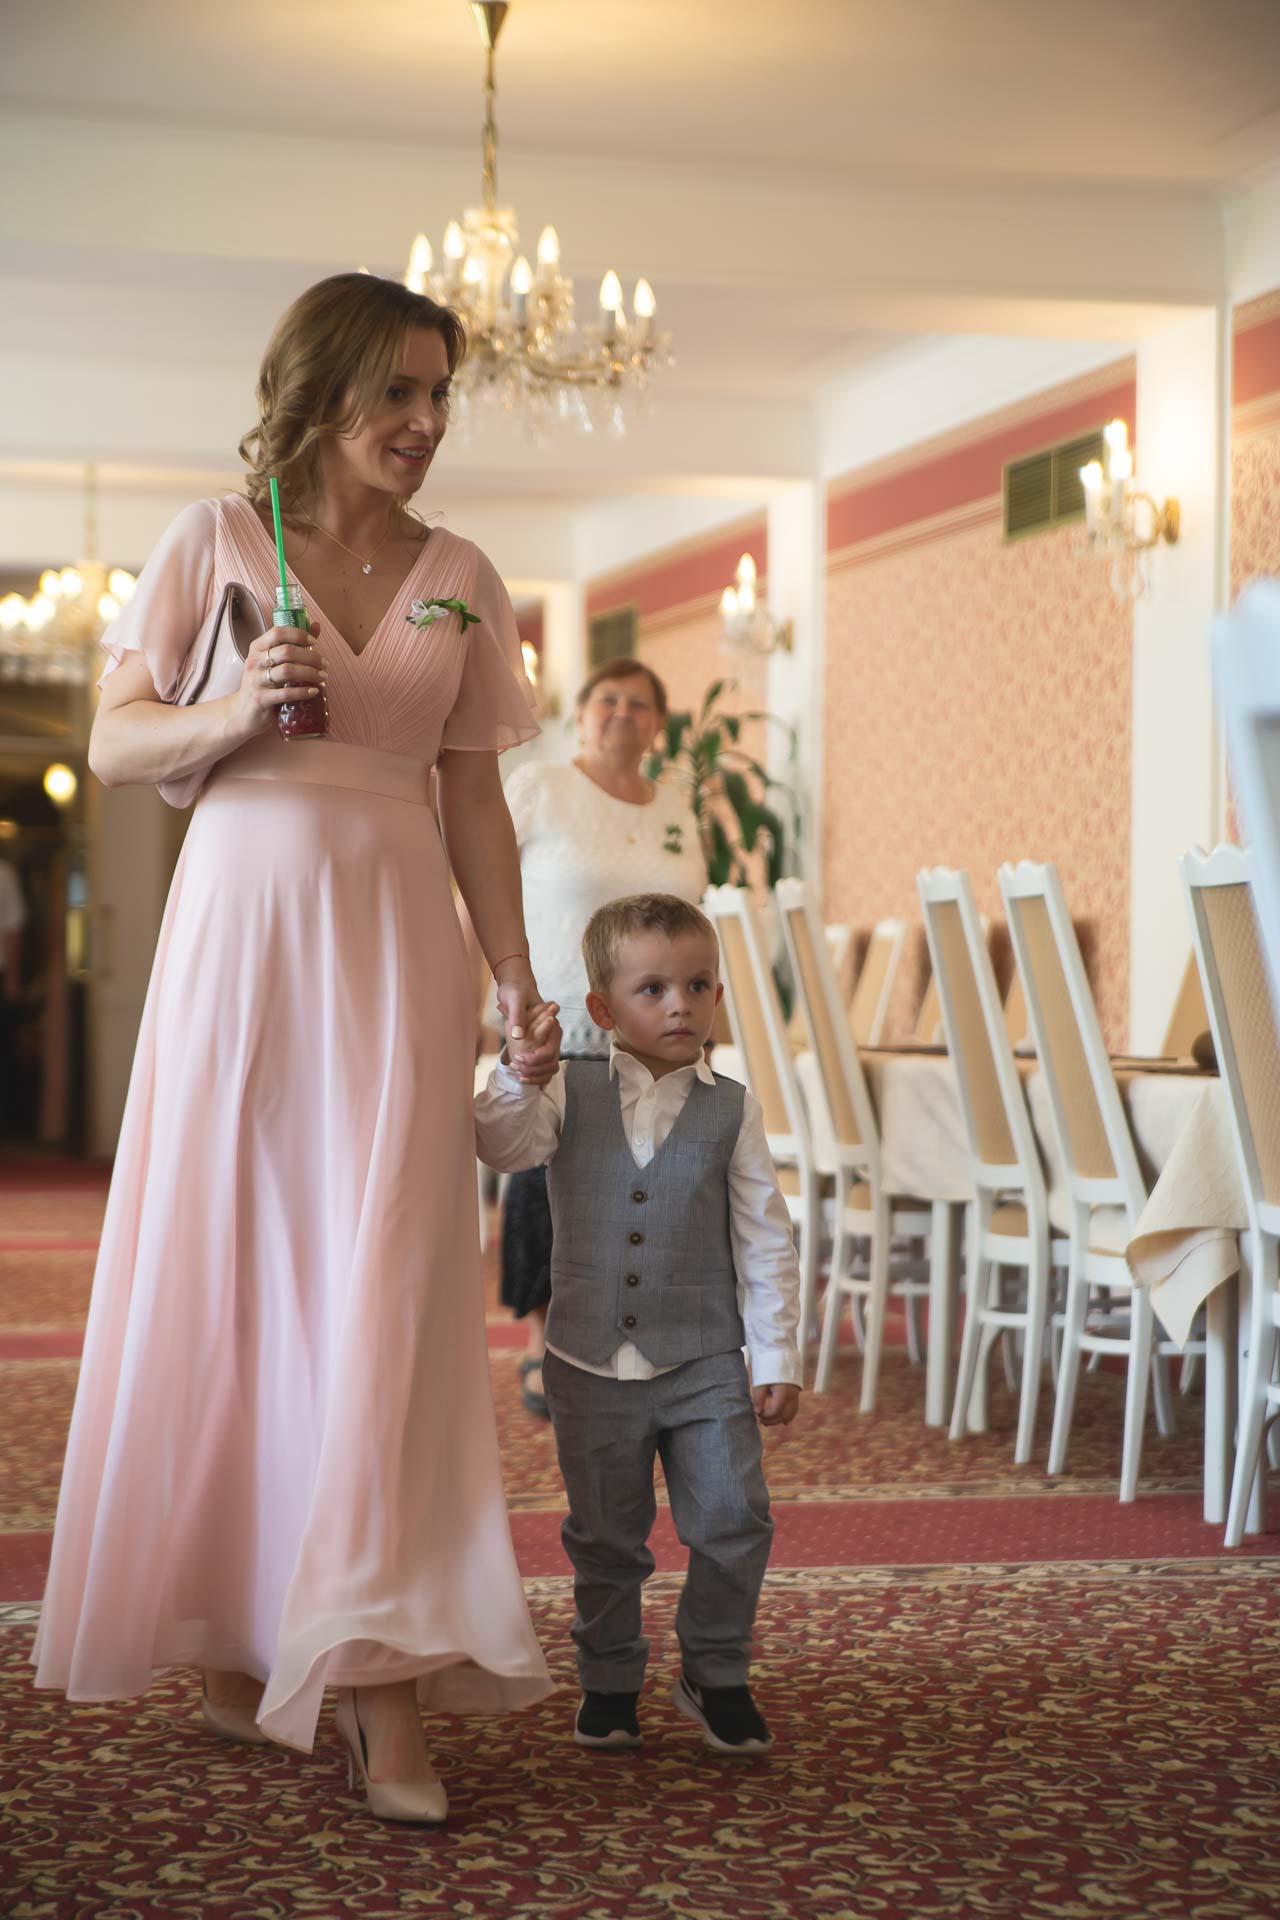 svatební-fotograf-svatebni-video-Nymburk-hotel-Ostrov-Beautyfoto-5920